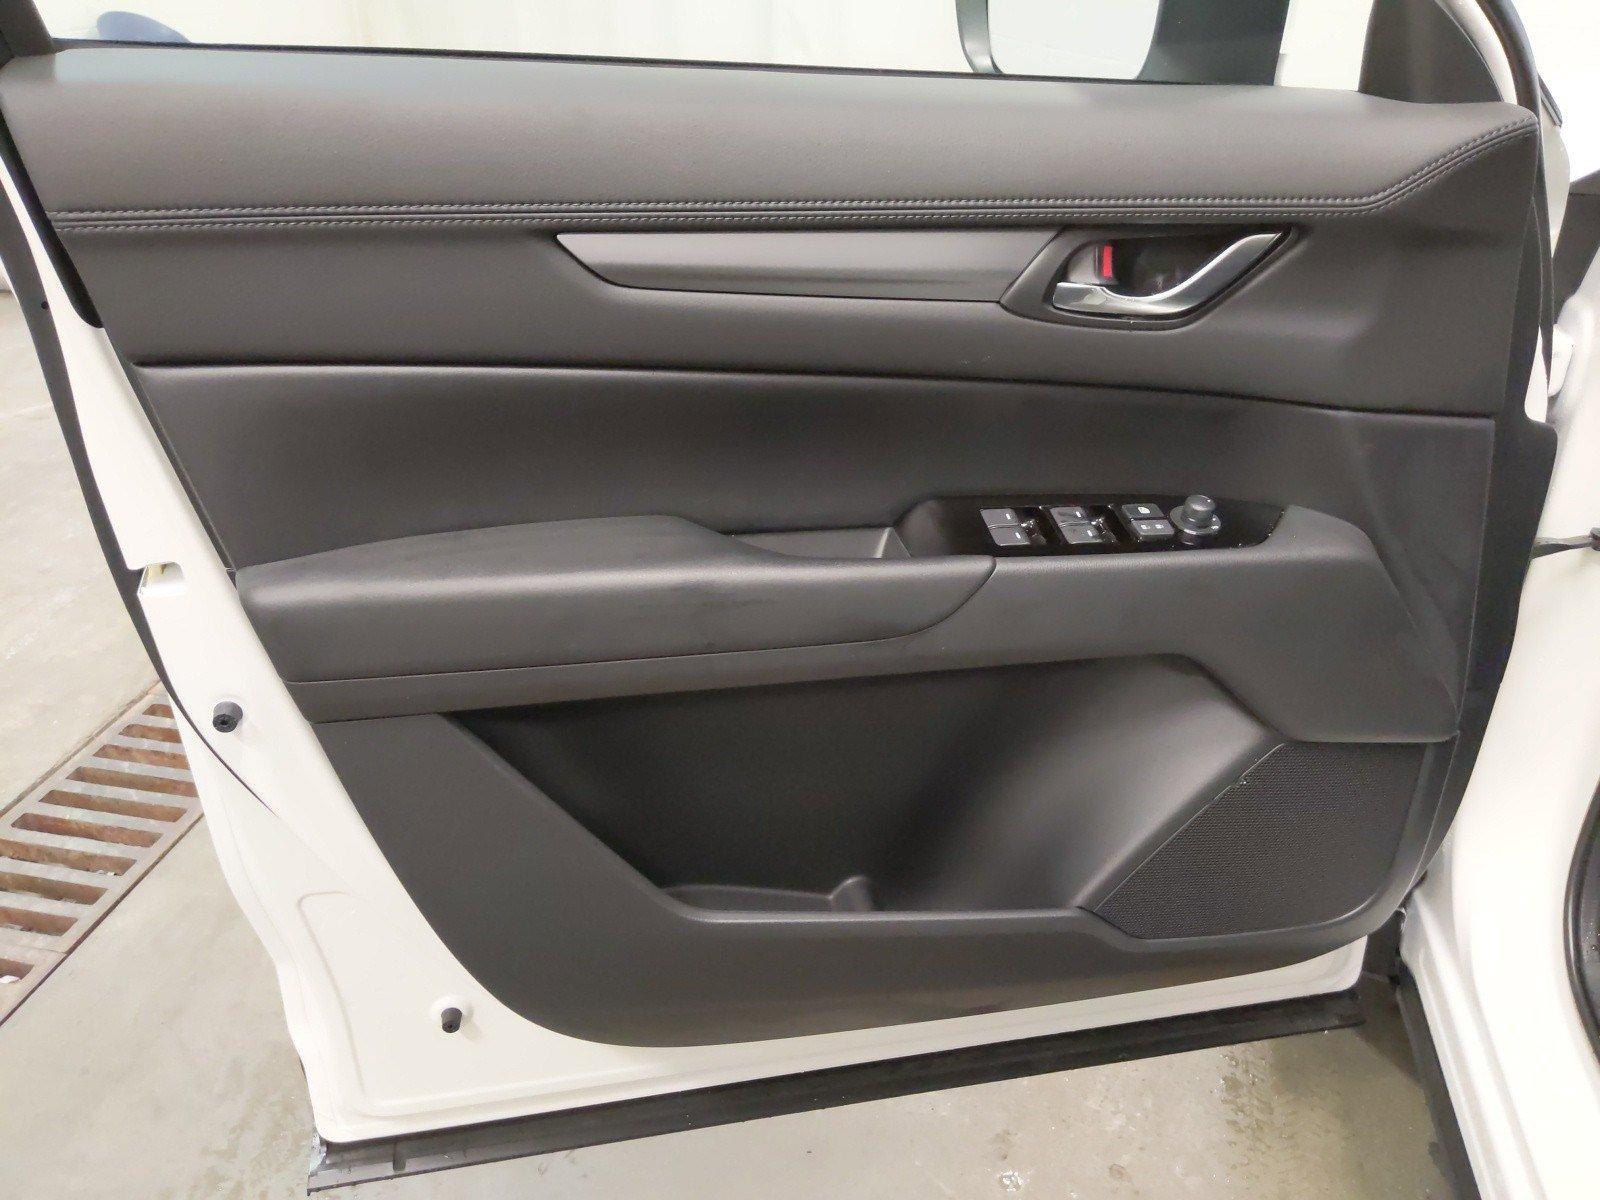 New 2020 Mazda Cx-5 Touring Sport Utility for sale in Lincoln NE